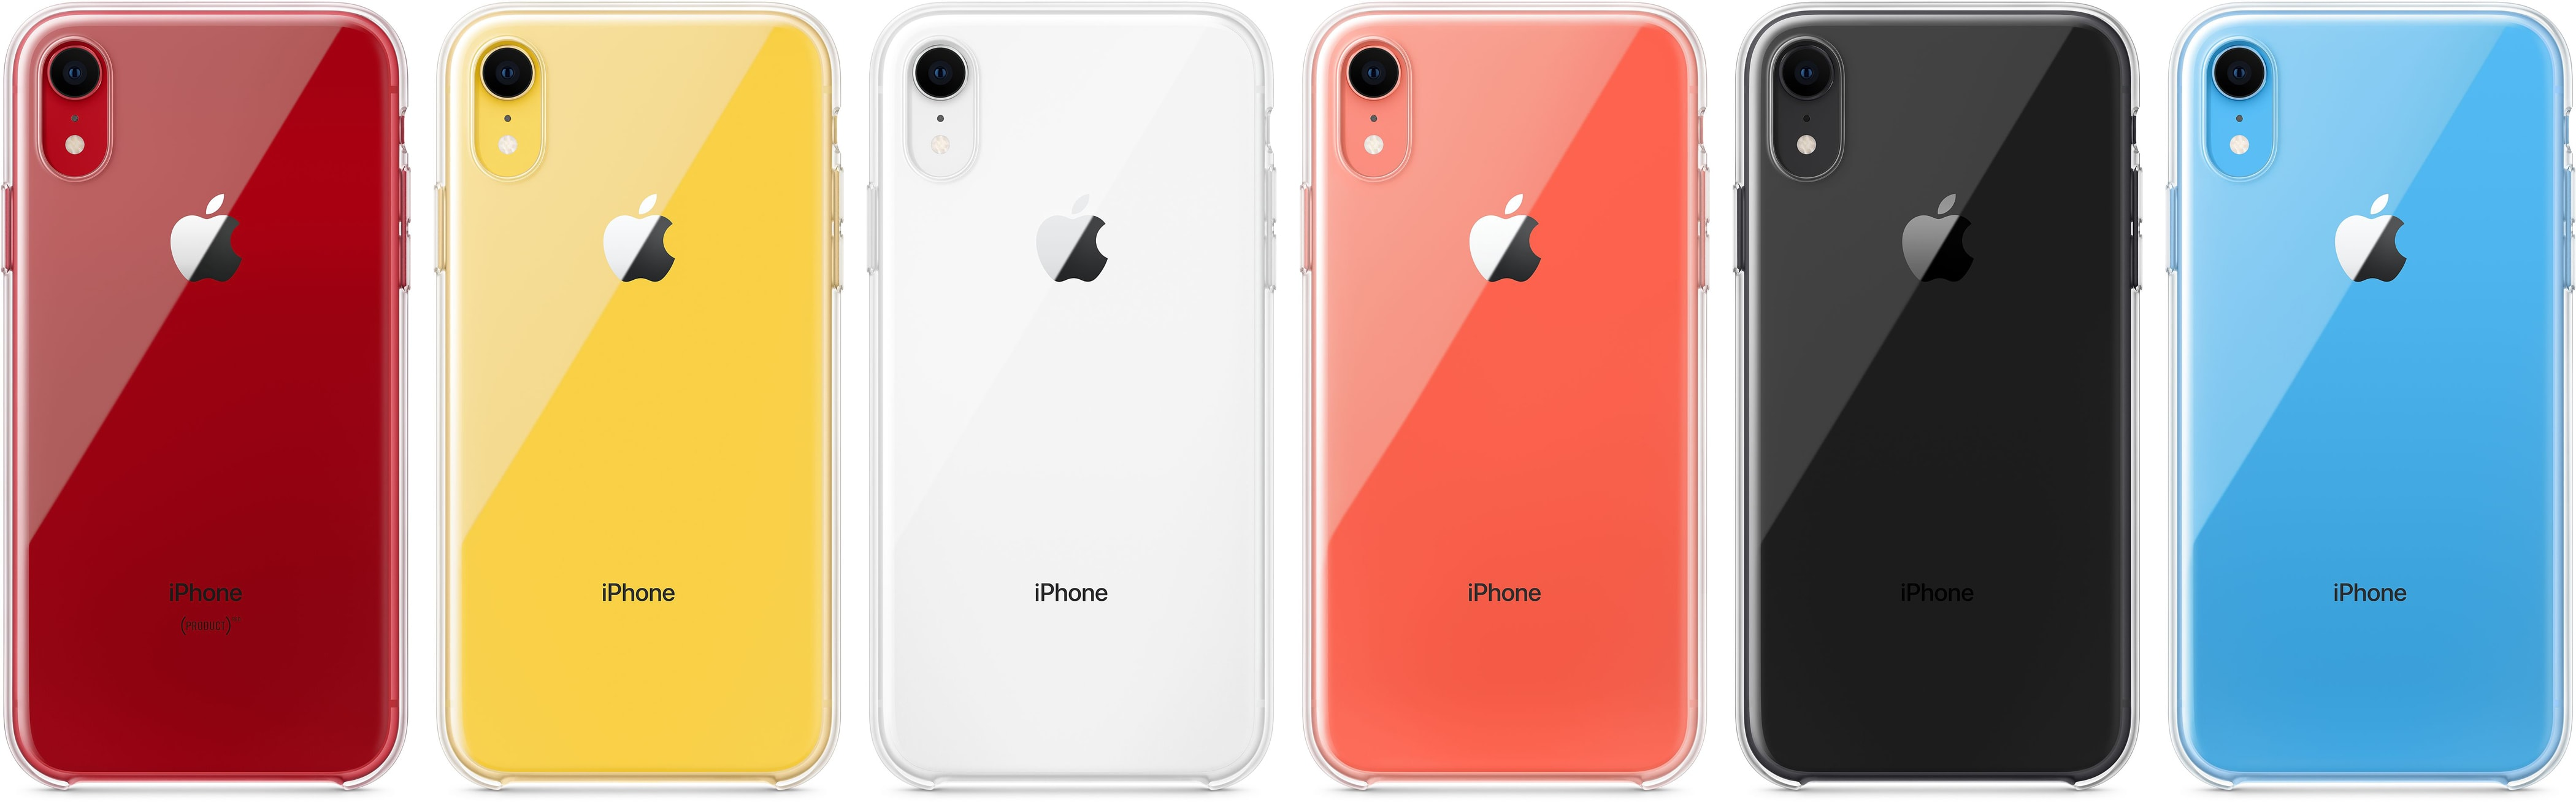 Capa transparente para iPhone XR (todas as cores)